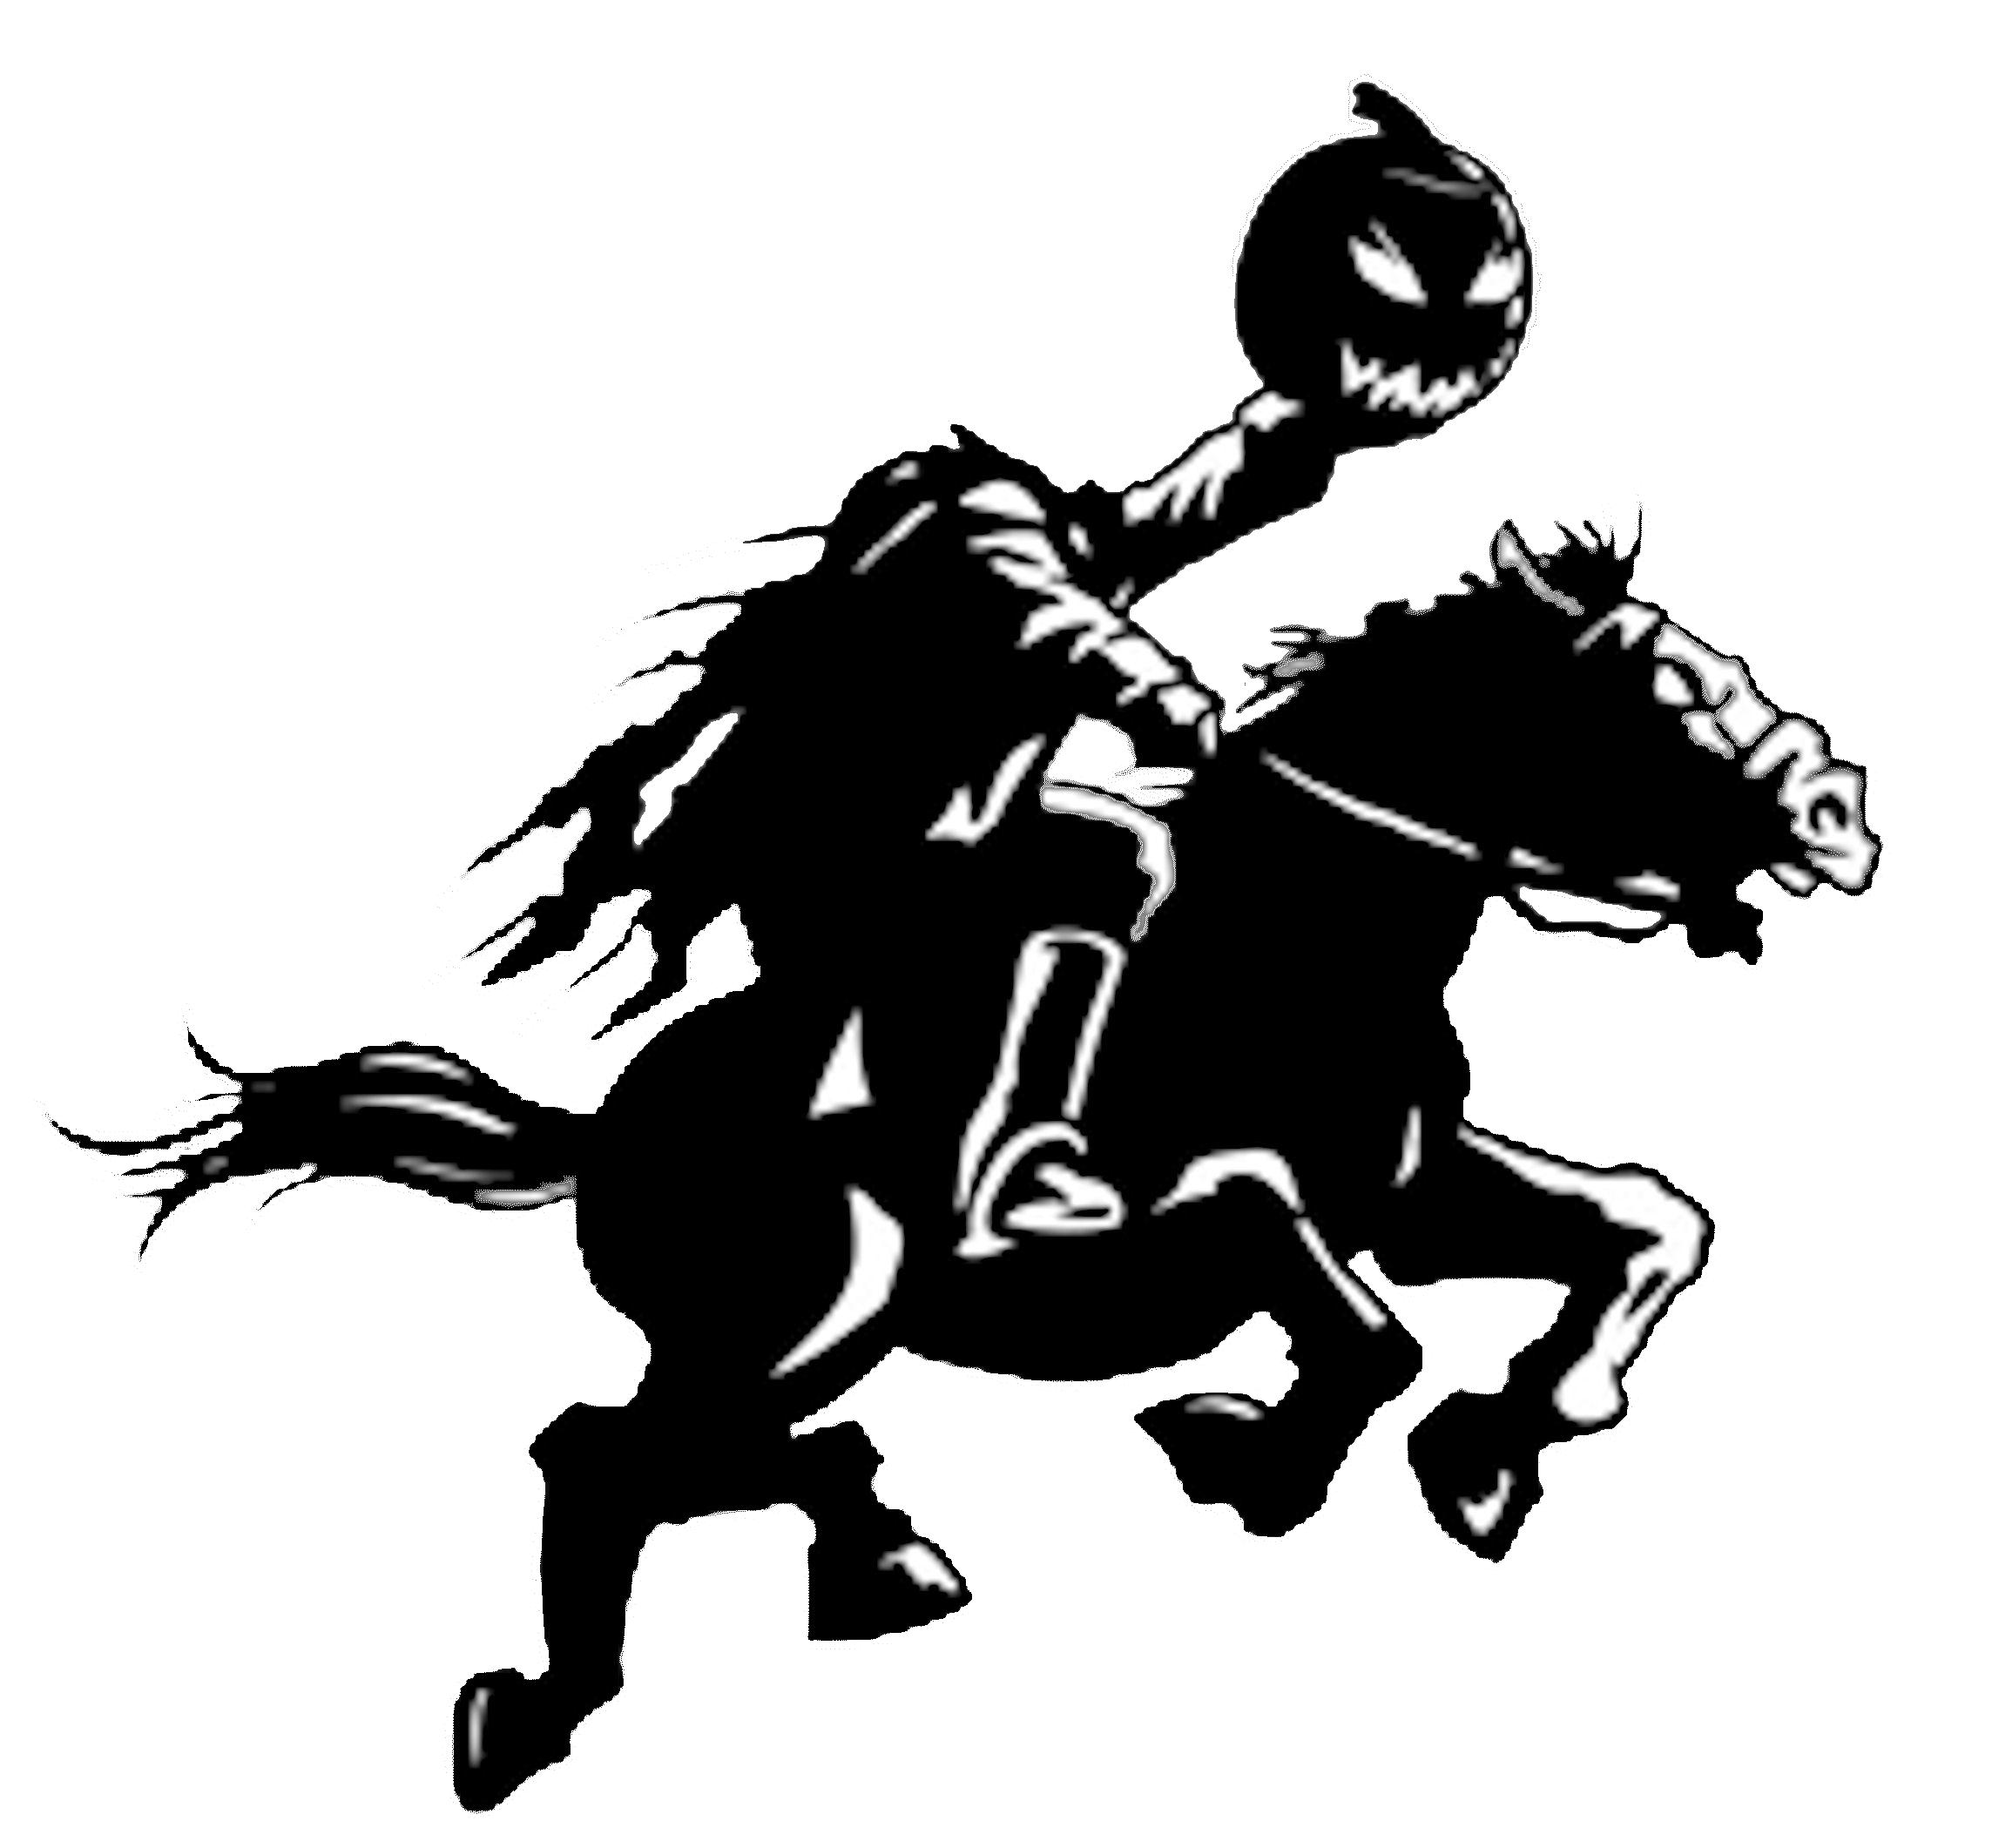 Horsemen clipart Com Horsemen Free Headles vector